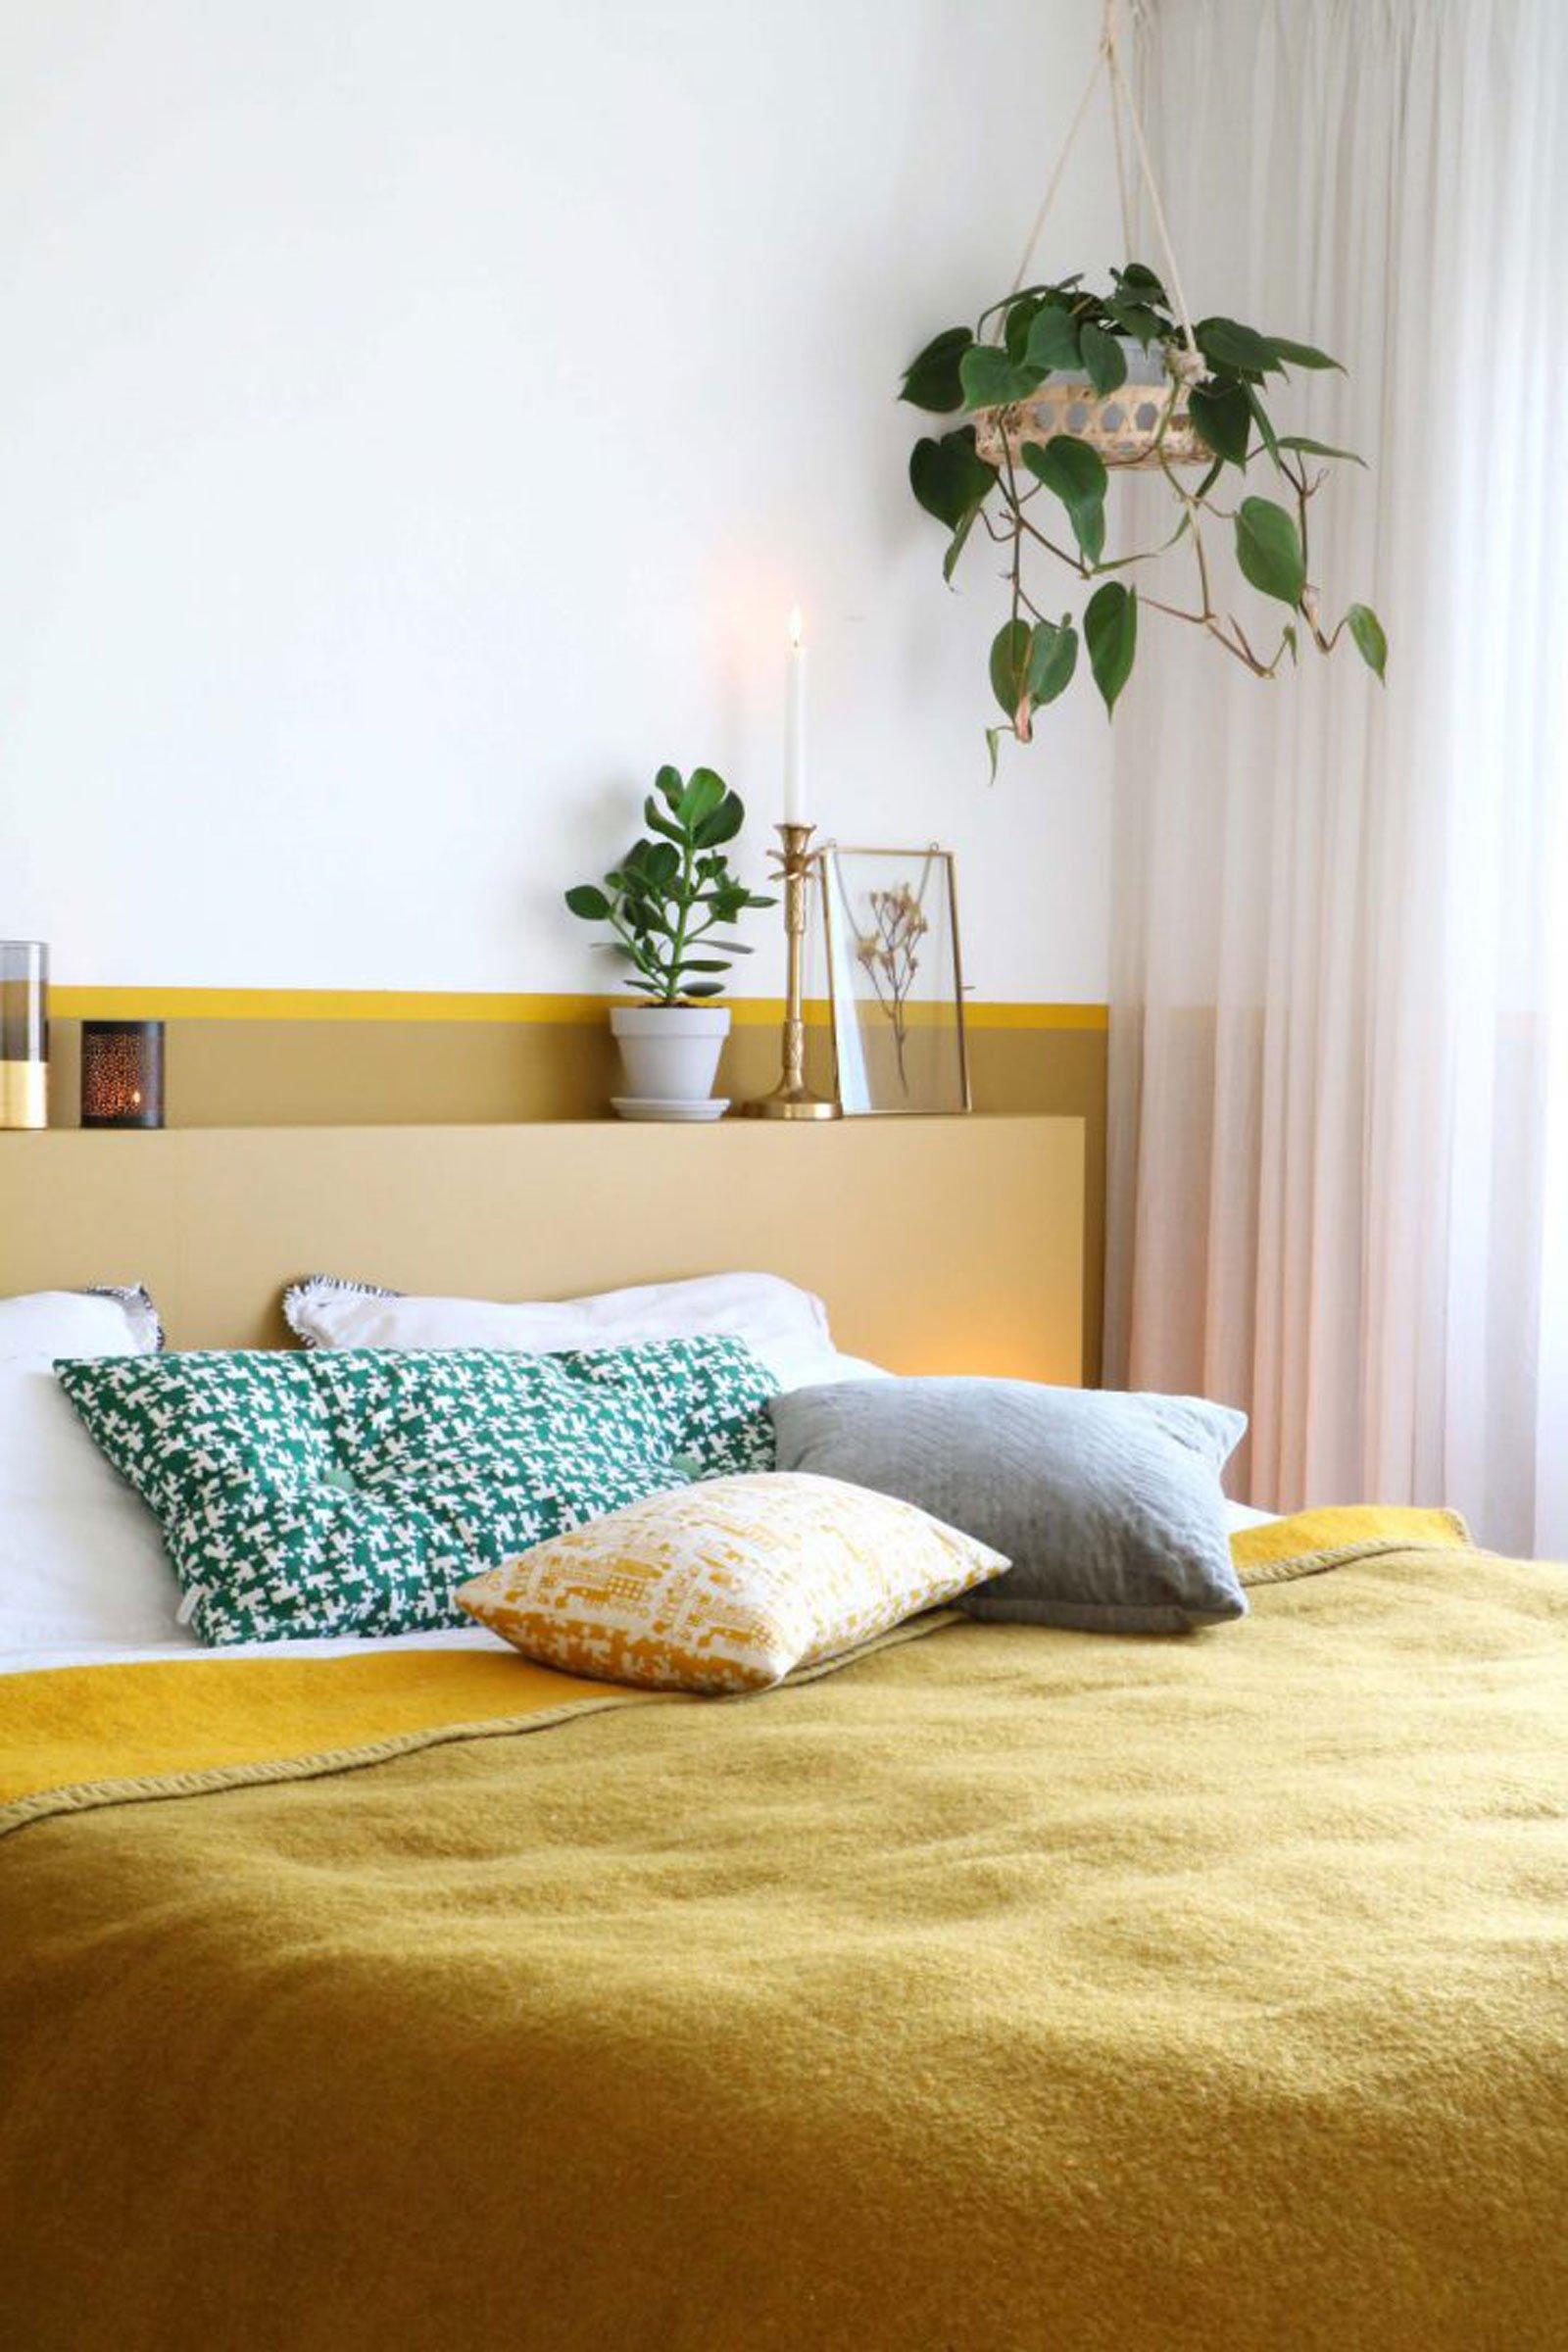 mustard yellow bed calm hygge nordic